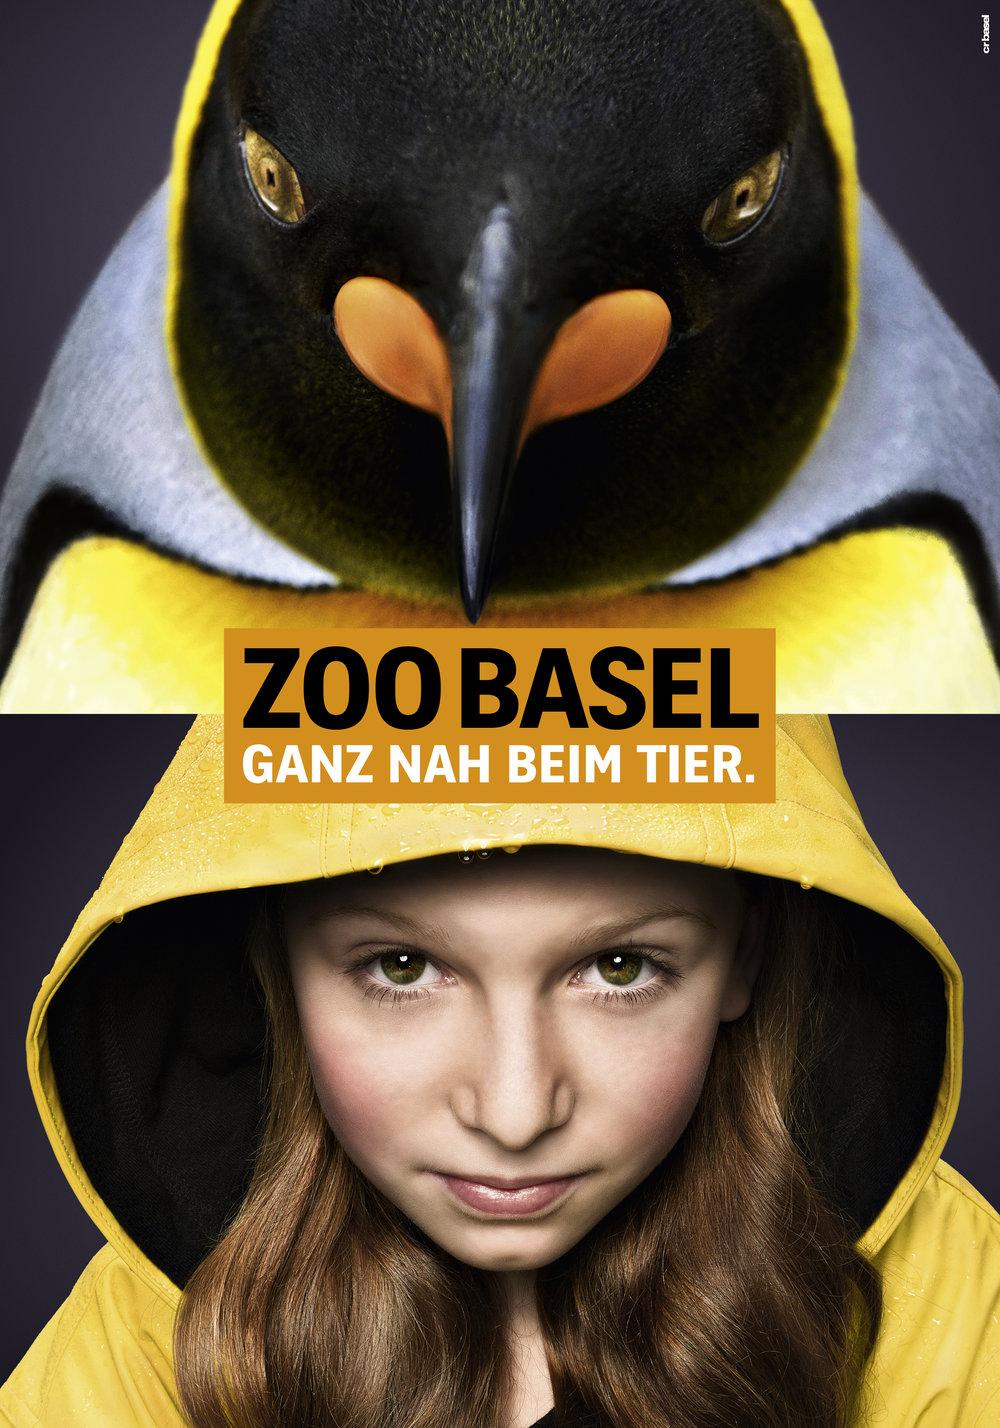 fs_arbeit_12_zooganznah_12_pinguin.jpeg